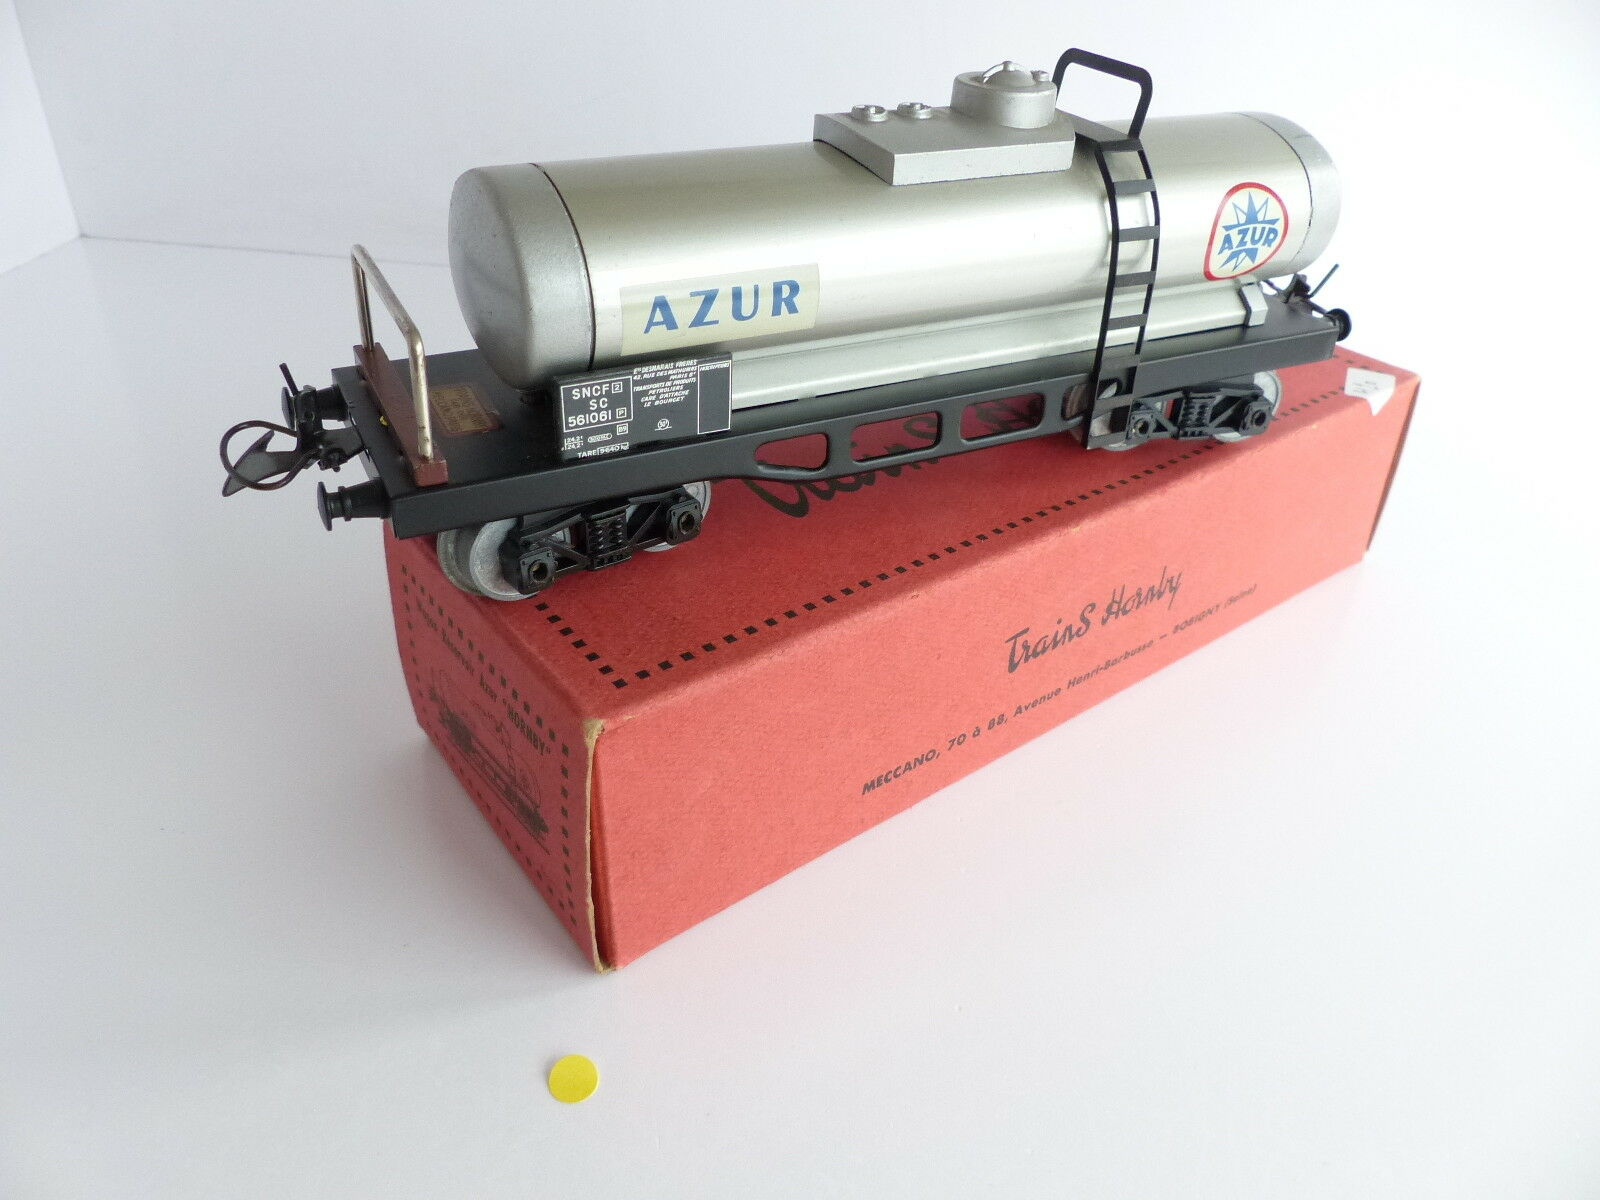 Hornby wagon tank has bogies azur sncf o scale no 3 plastic bogies